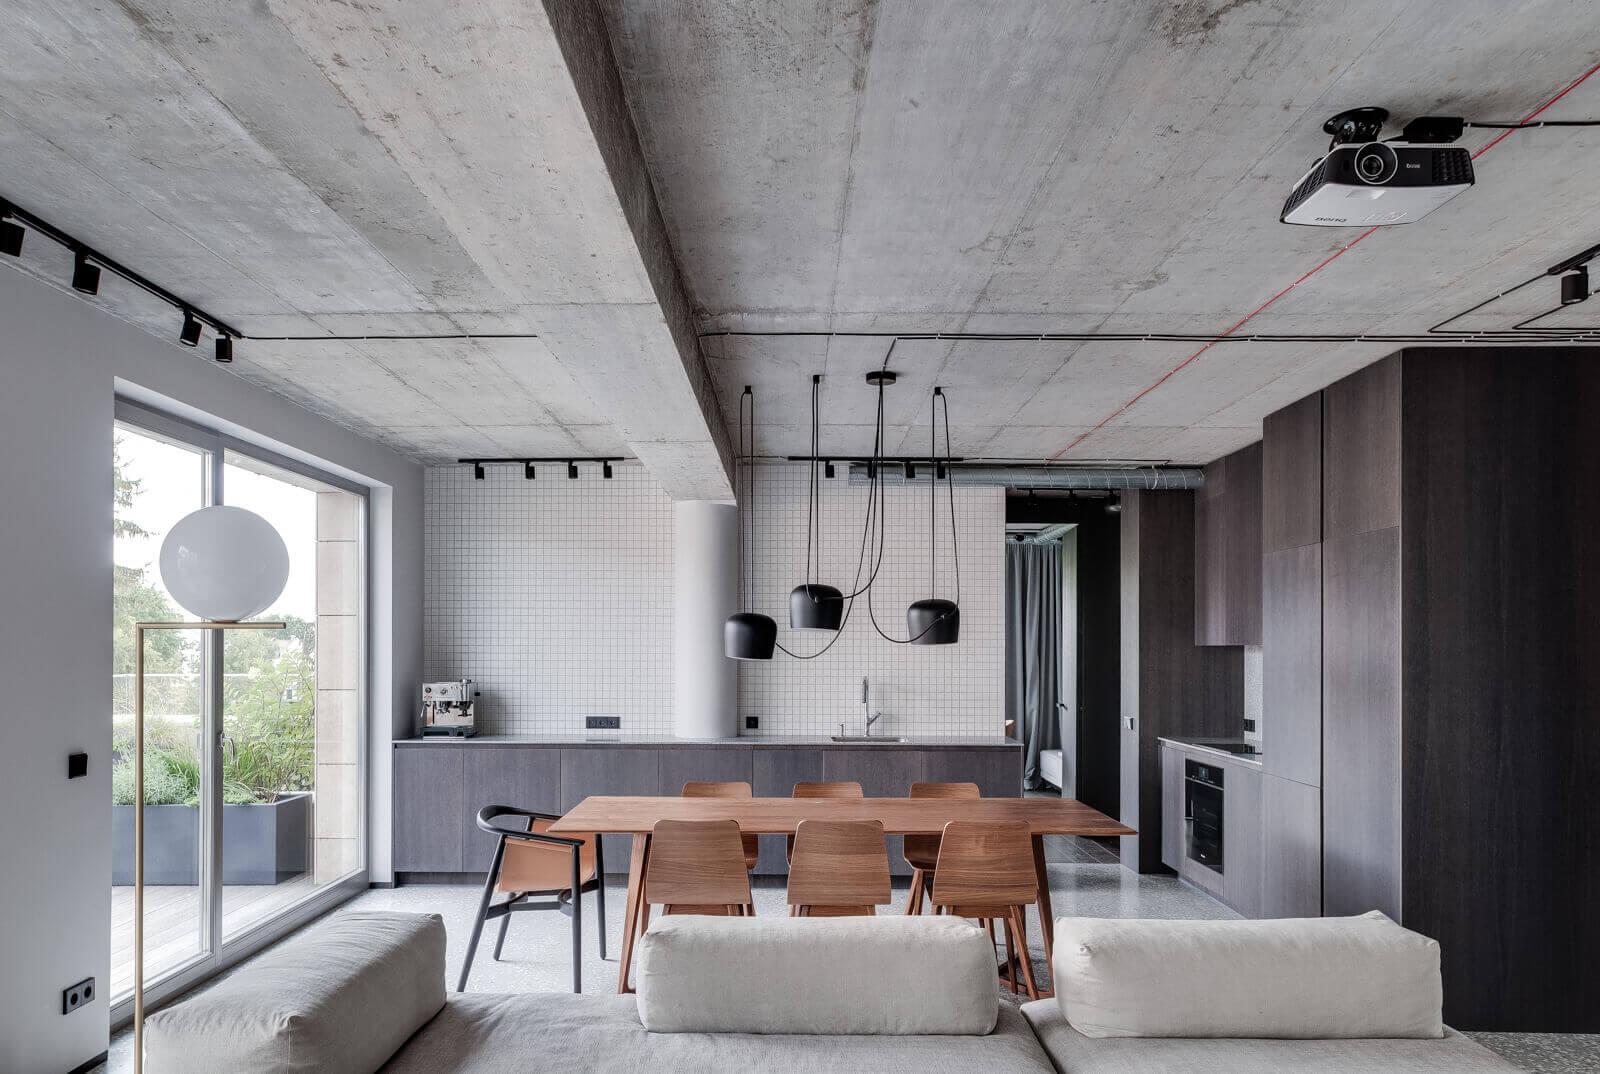 Apartamentai Vilniuje